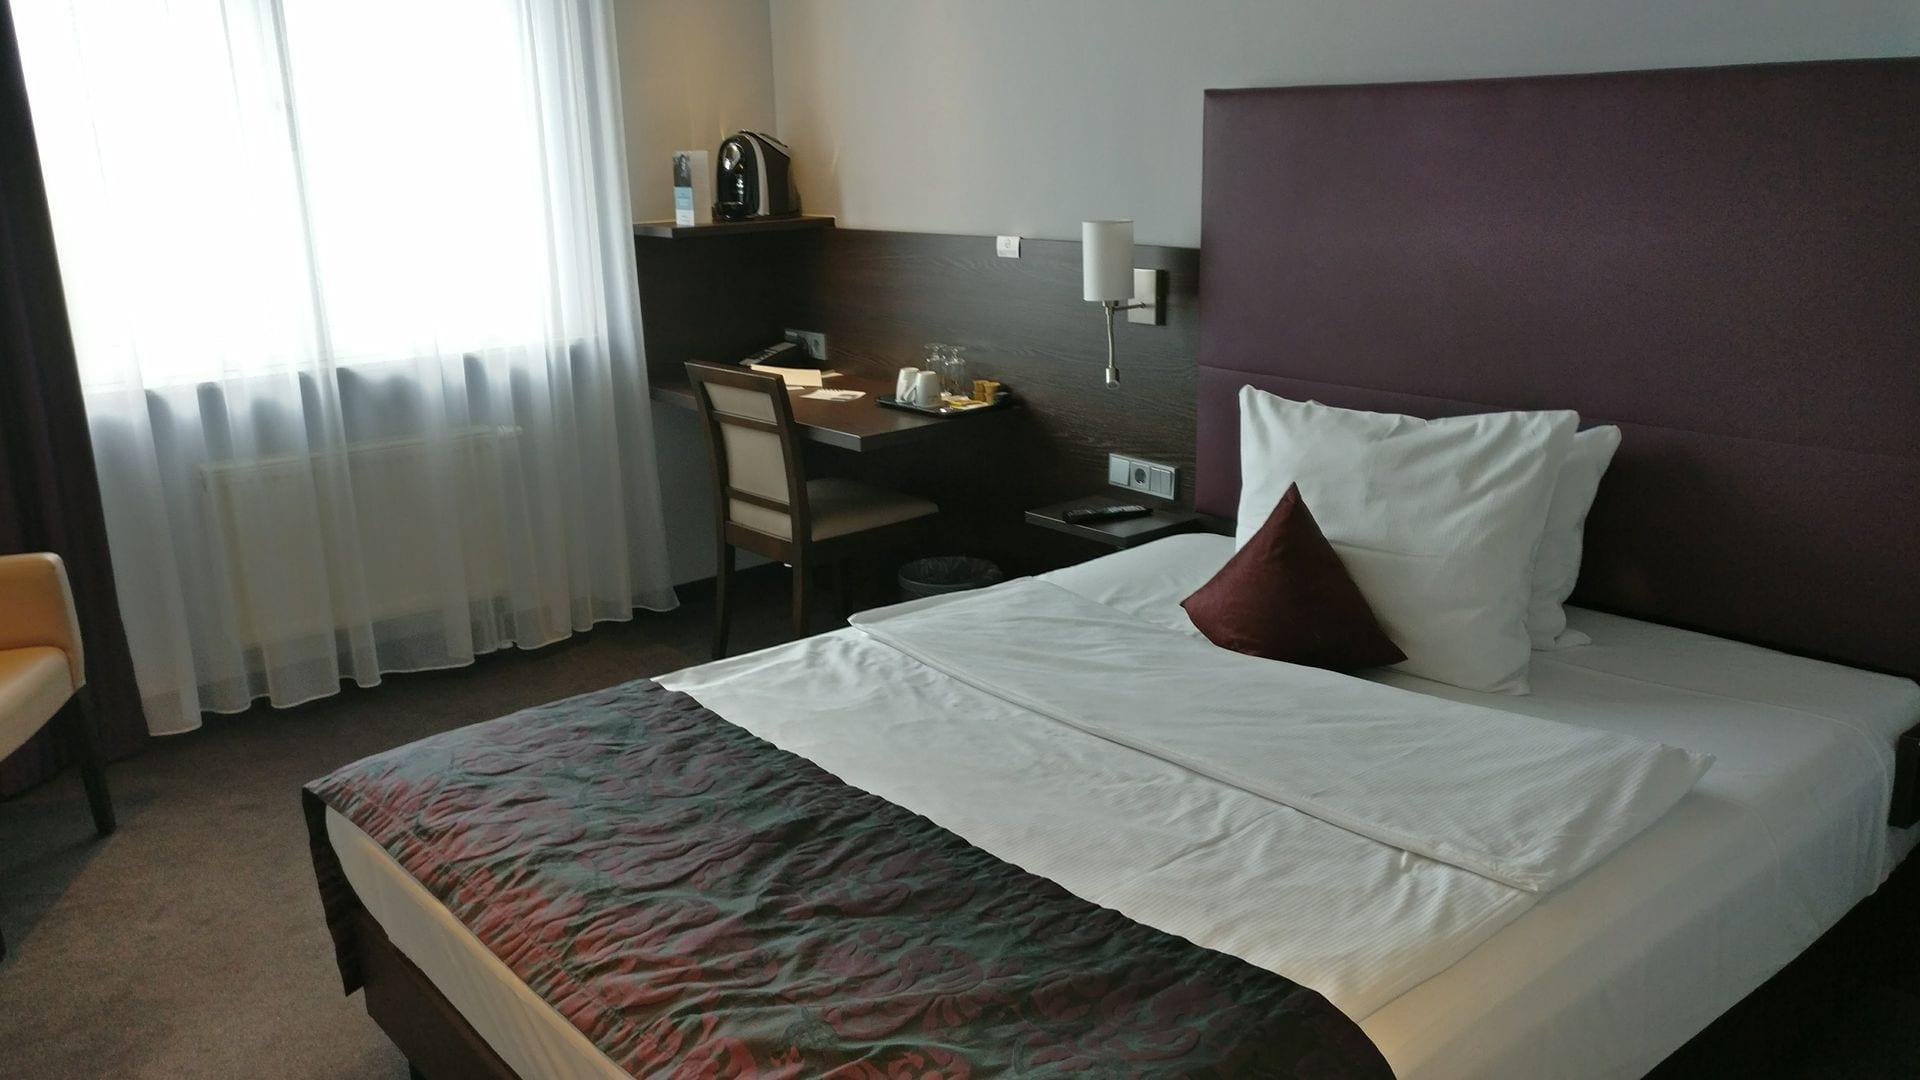 bett frankfurt cool ikea askvoll bett betten with bett frankfurt interesting das with bett. Black Bedroom Furniture Sets. Home Design Ideas